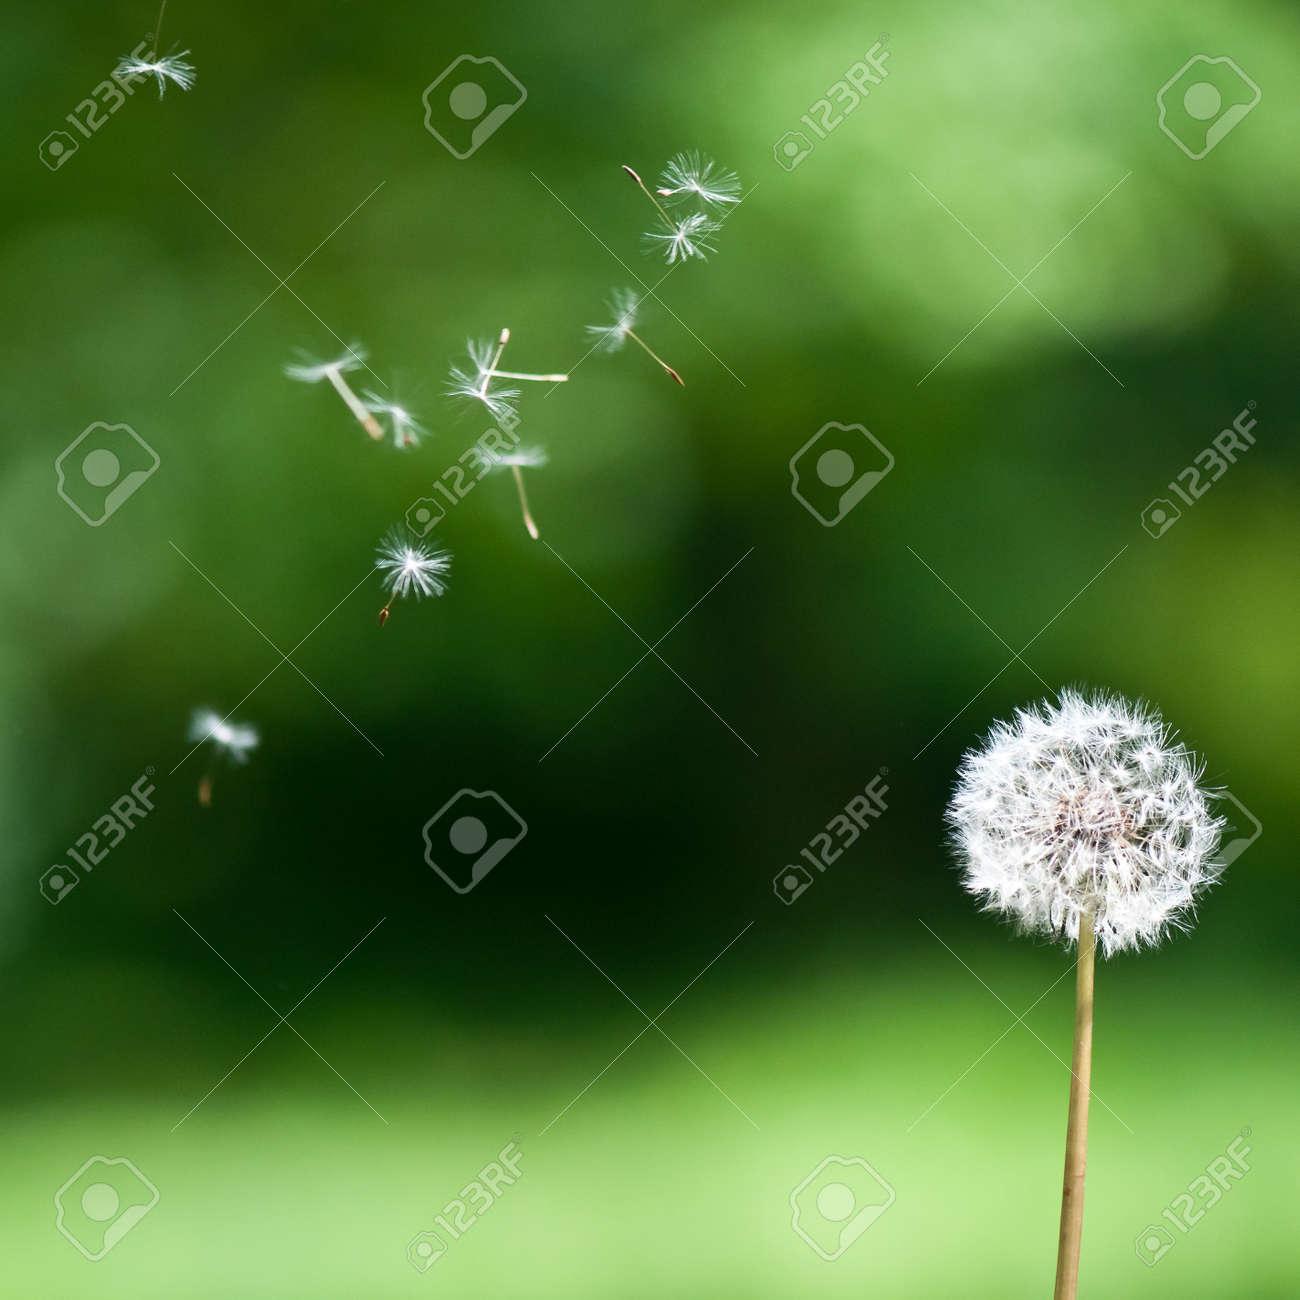 A wind blown dandelion against a green background - 14701764